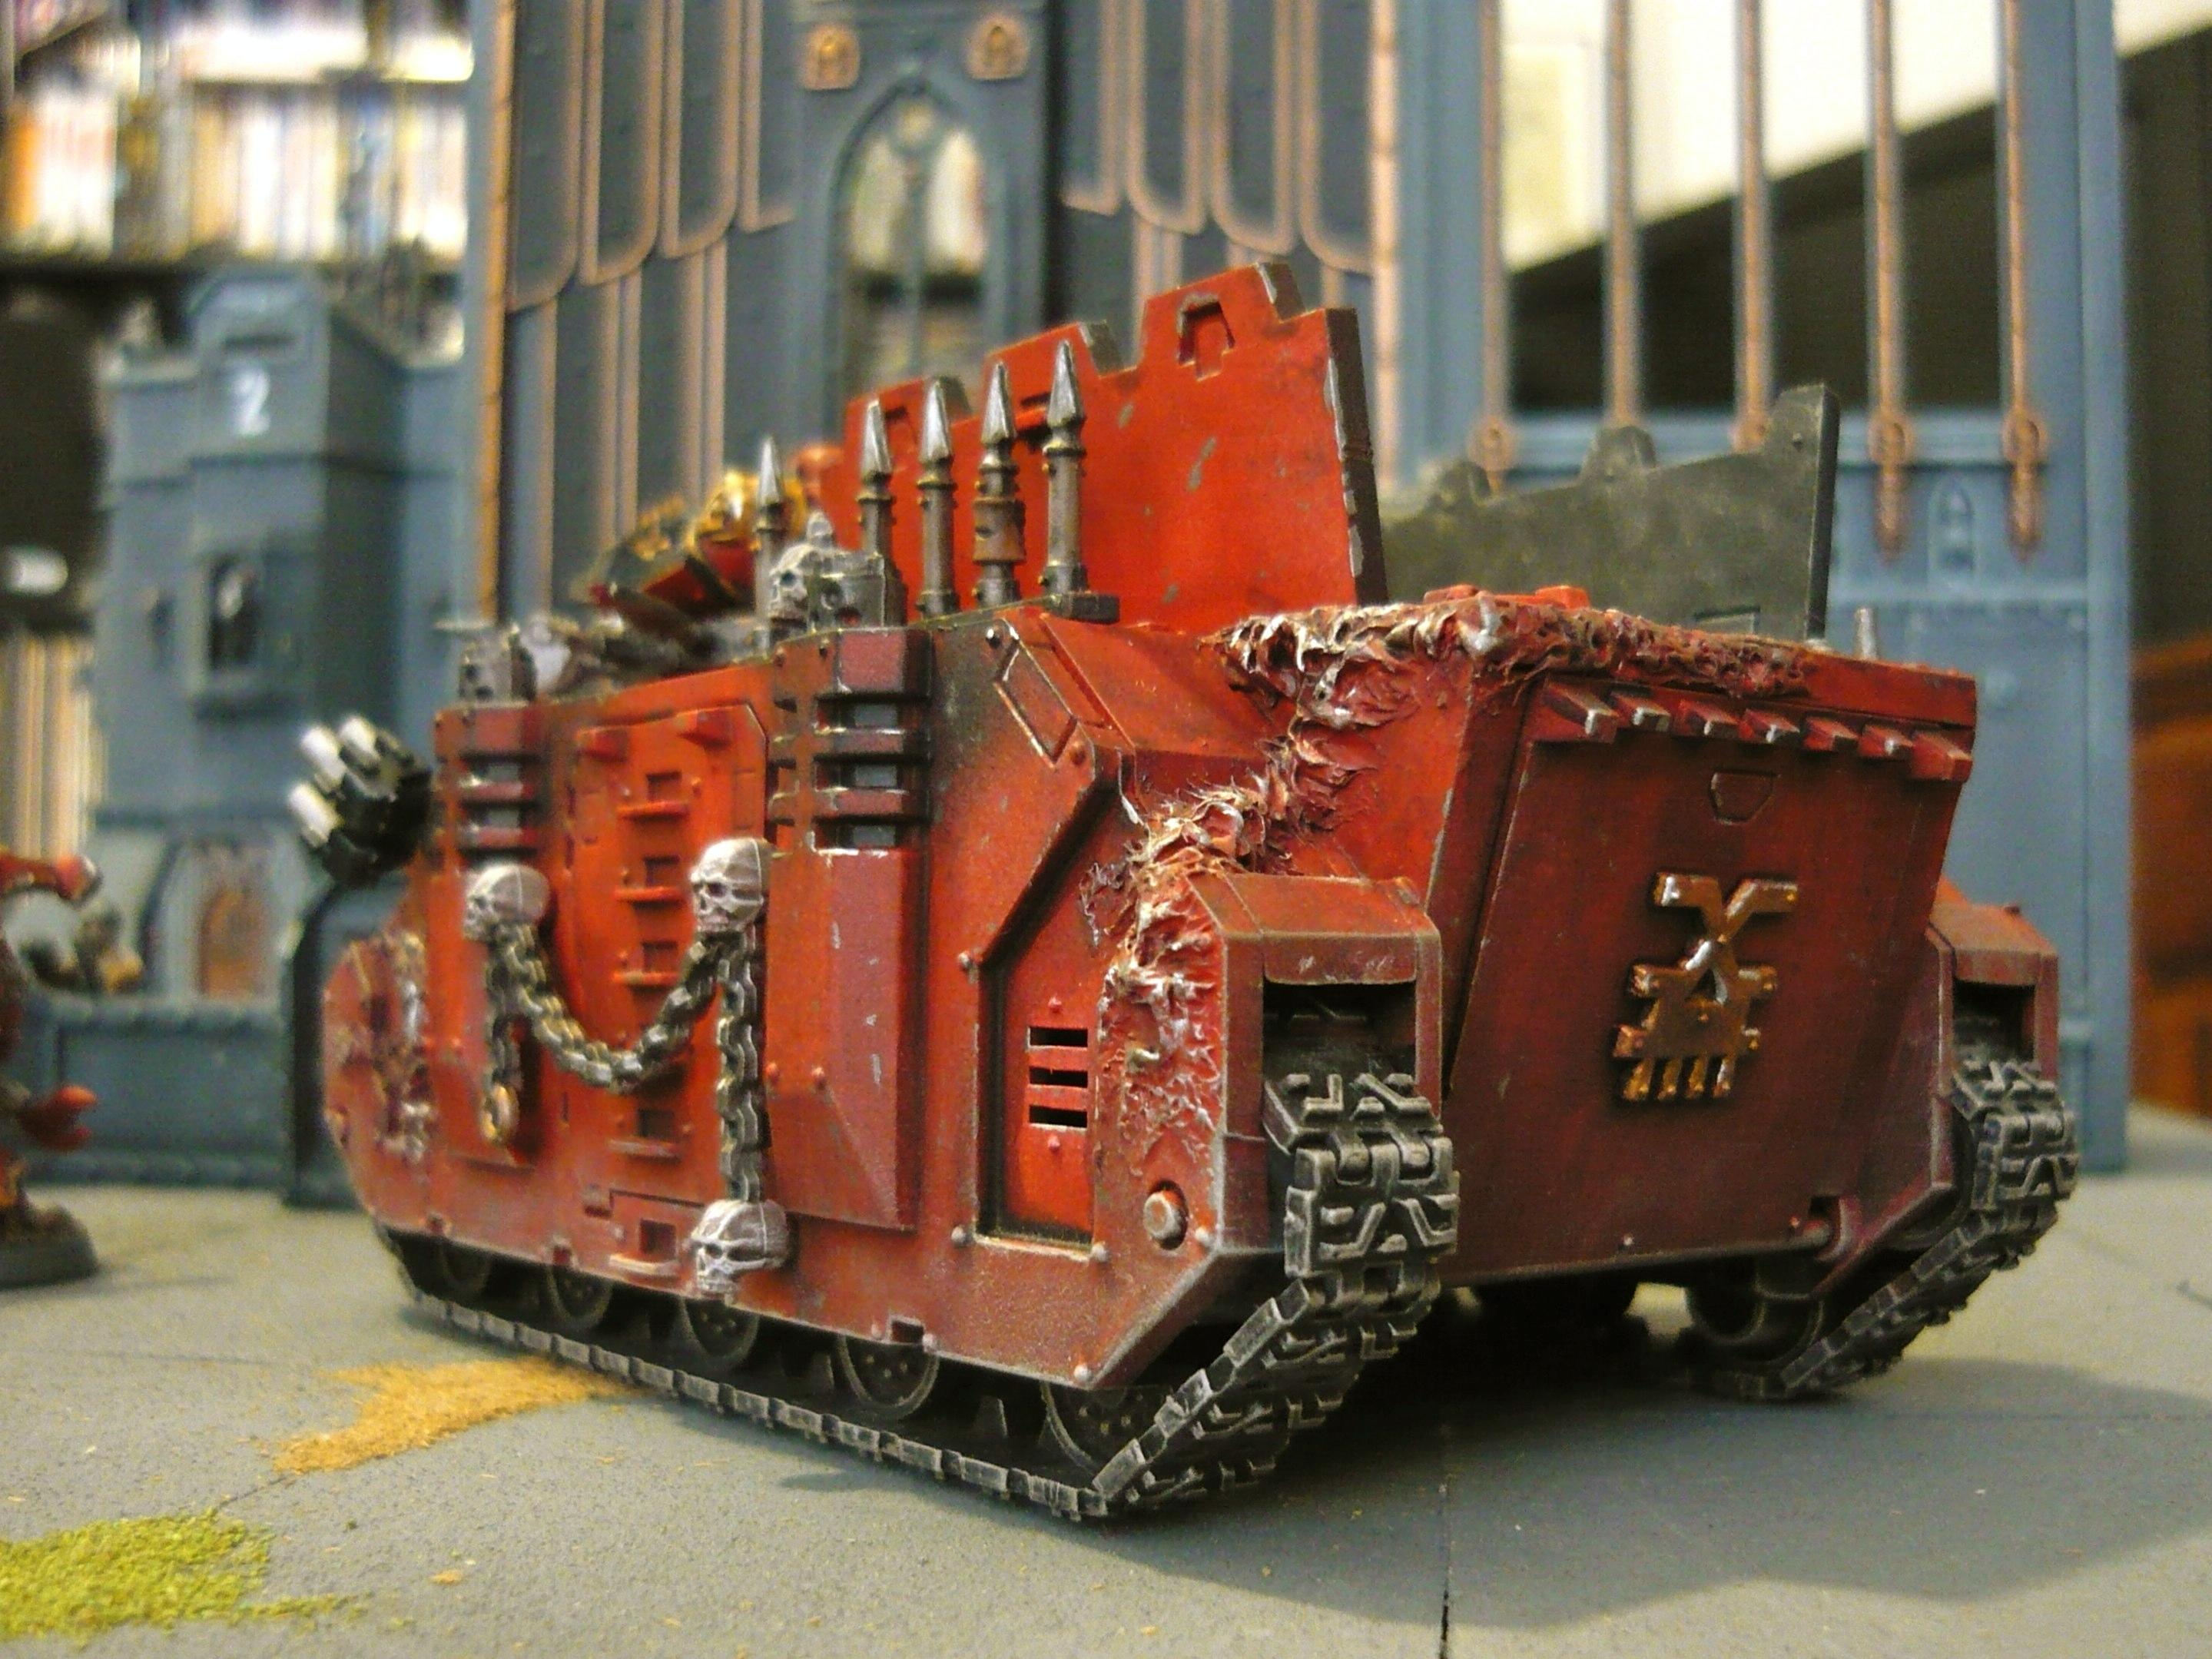 Berseker, Caos Rhino, Chaos, Chaos Rhino, Khorne, Renegade, Space Marines, Warhammer 40,000